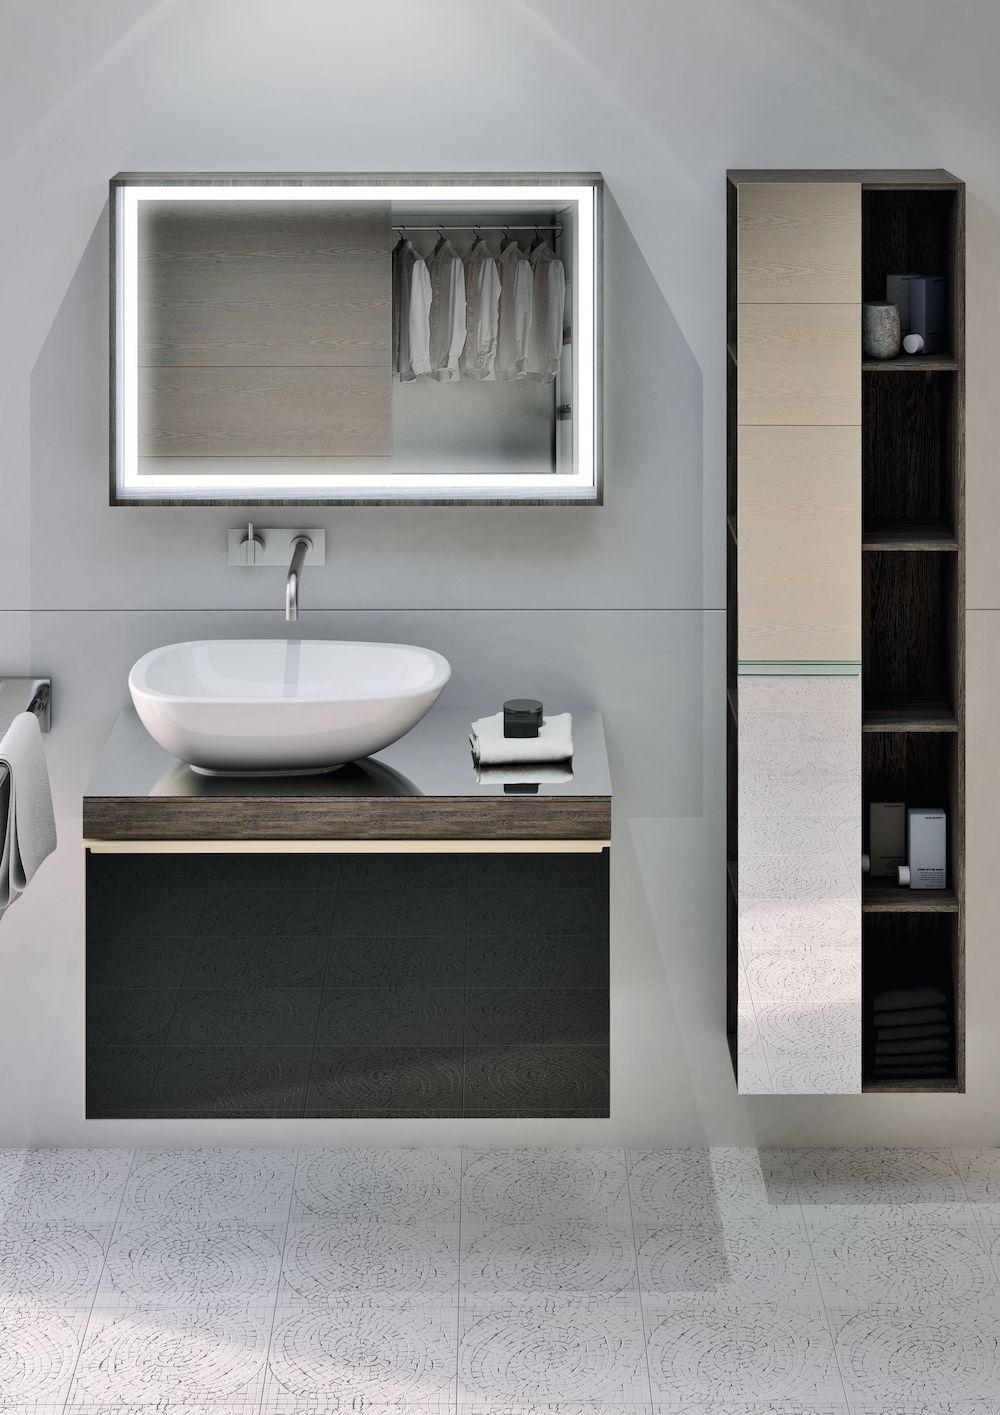 Image of light and bright modern bathroom